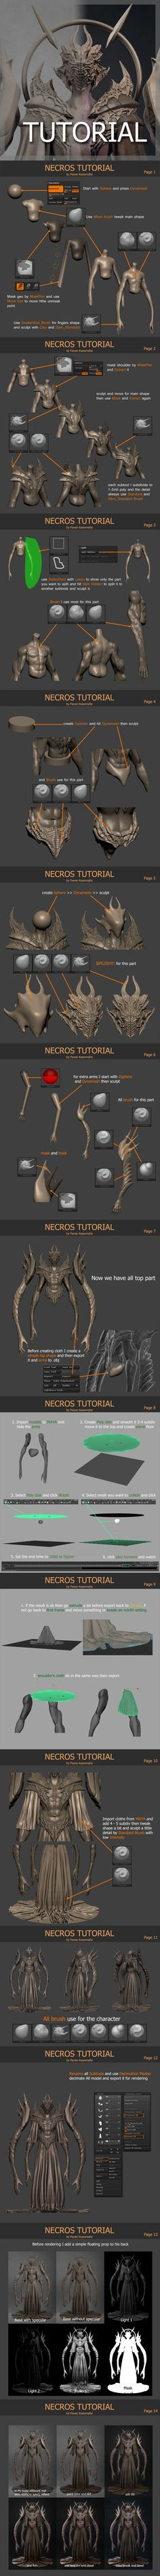 Necros [Tutorial] by Khempavee.deviantart.com on @DeviantArt                                                                                                                                                      Plus